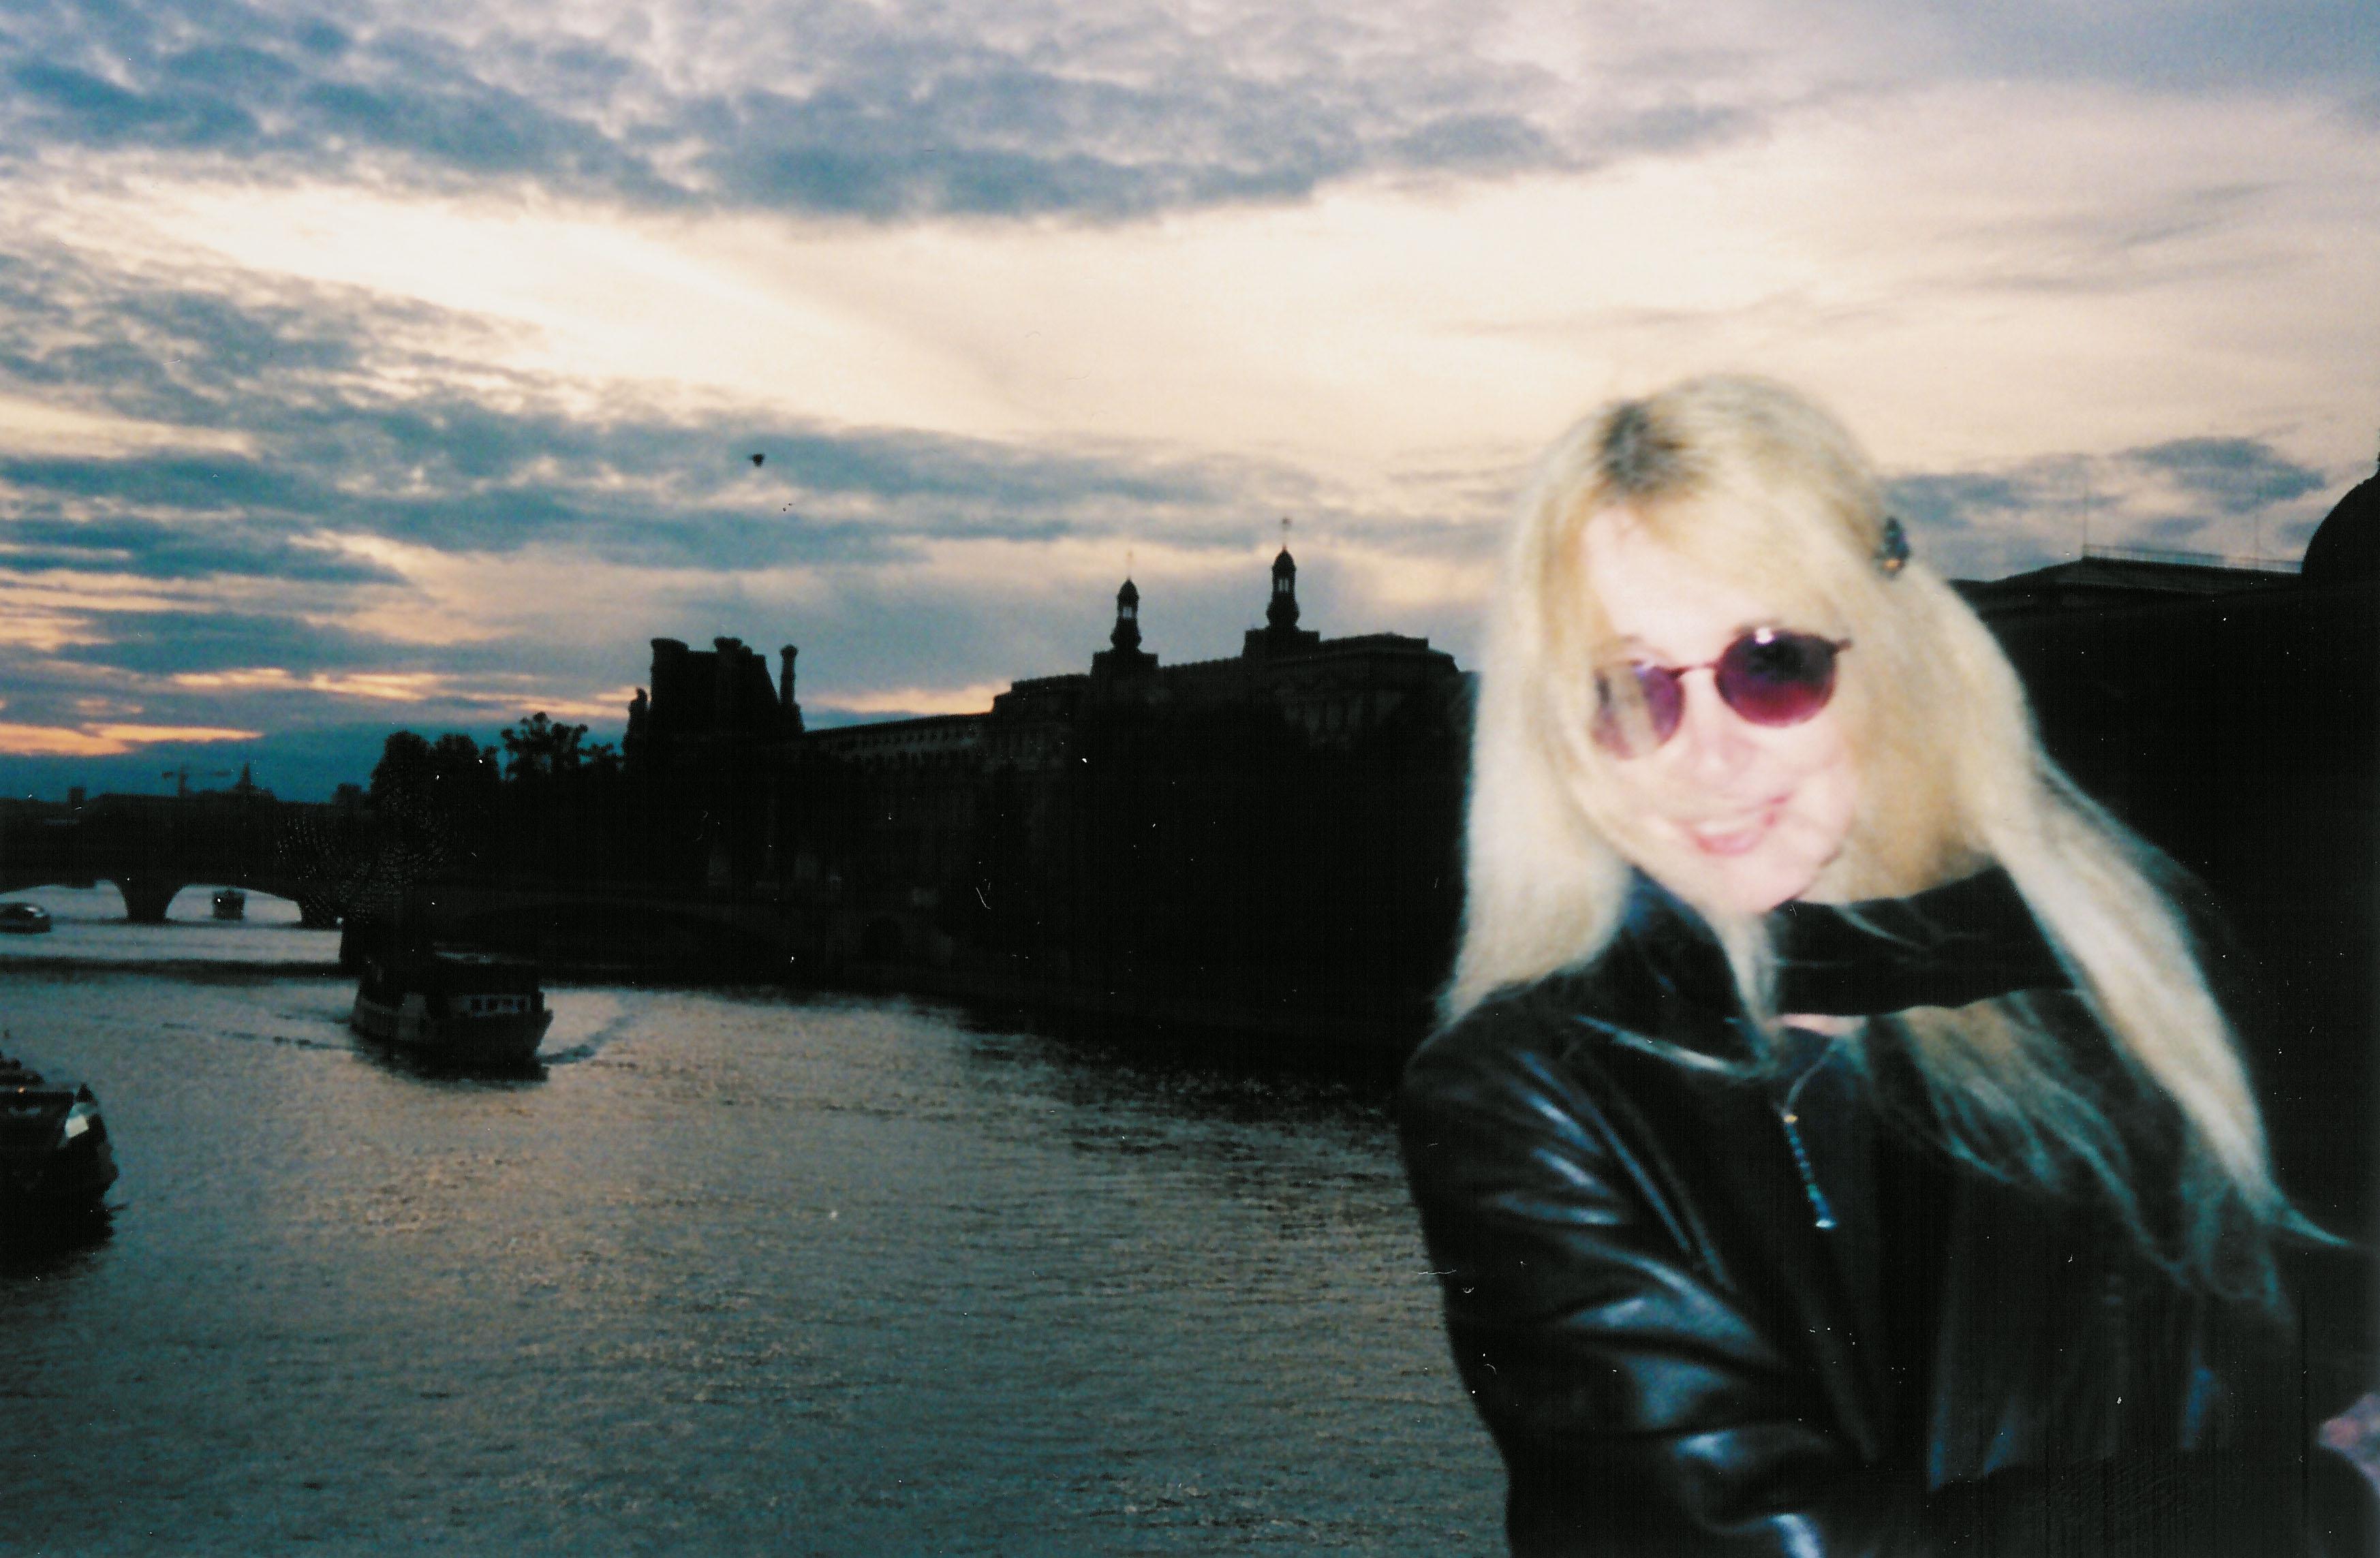 Lyn Lifshin